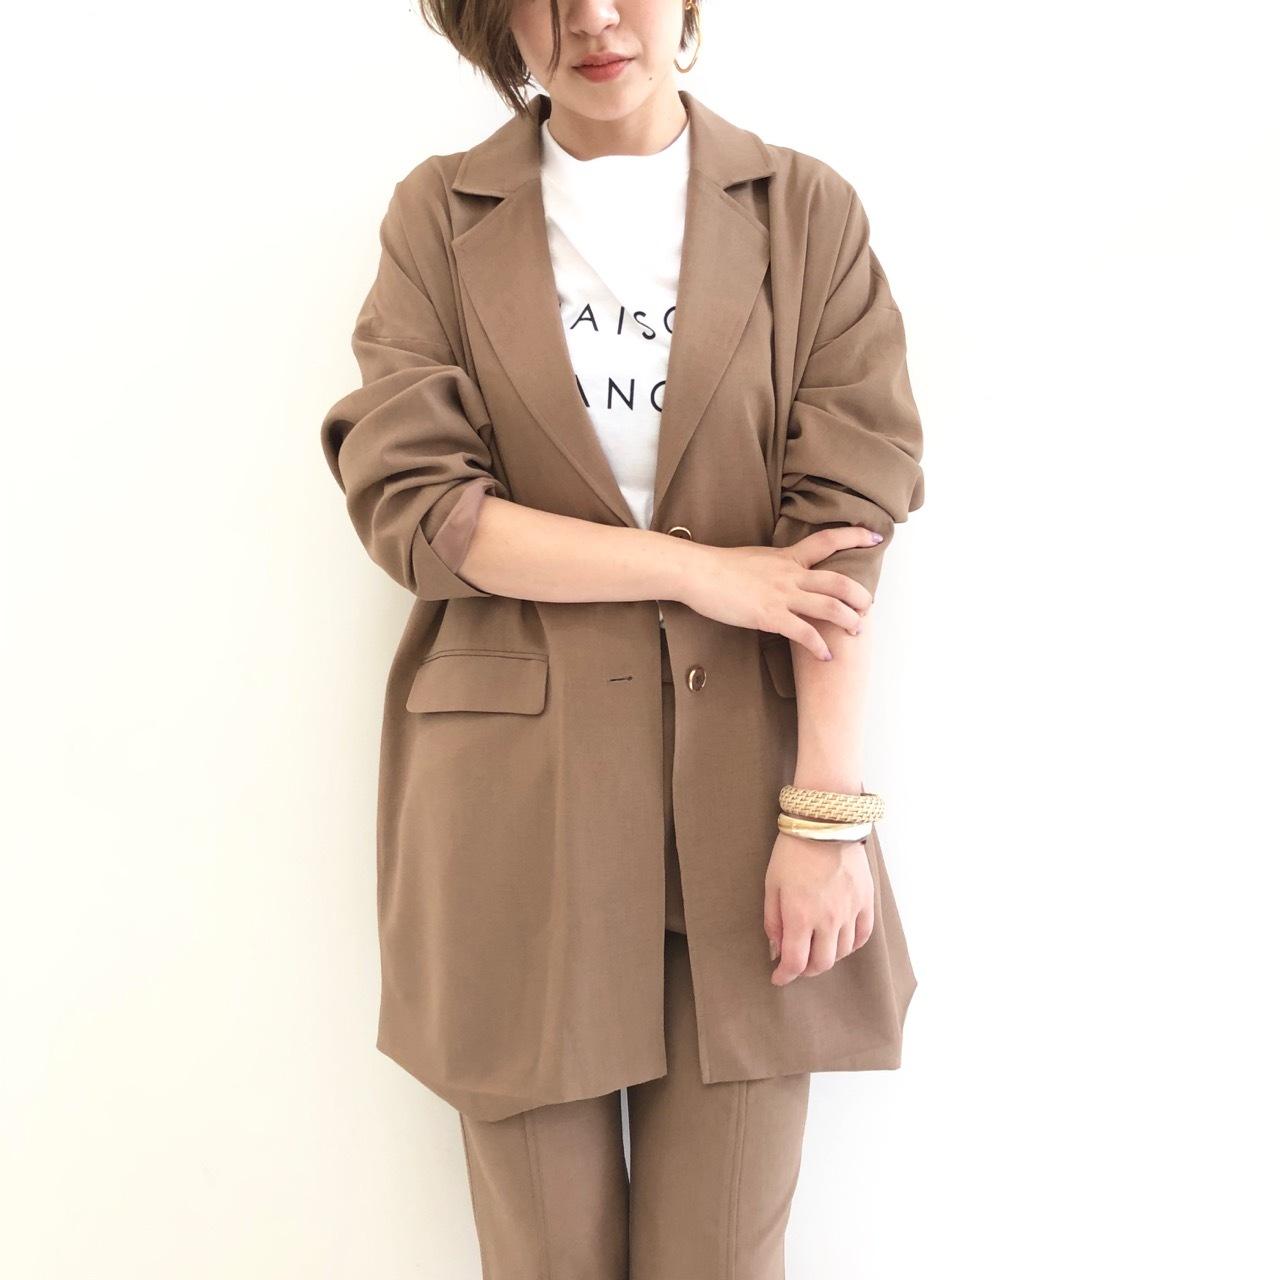 【 Chignonstar 】- 4192-094 - テーラードジャケット